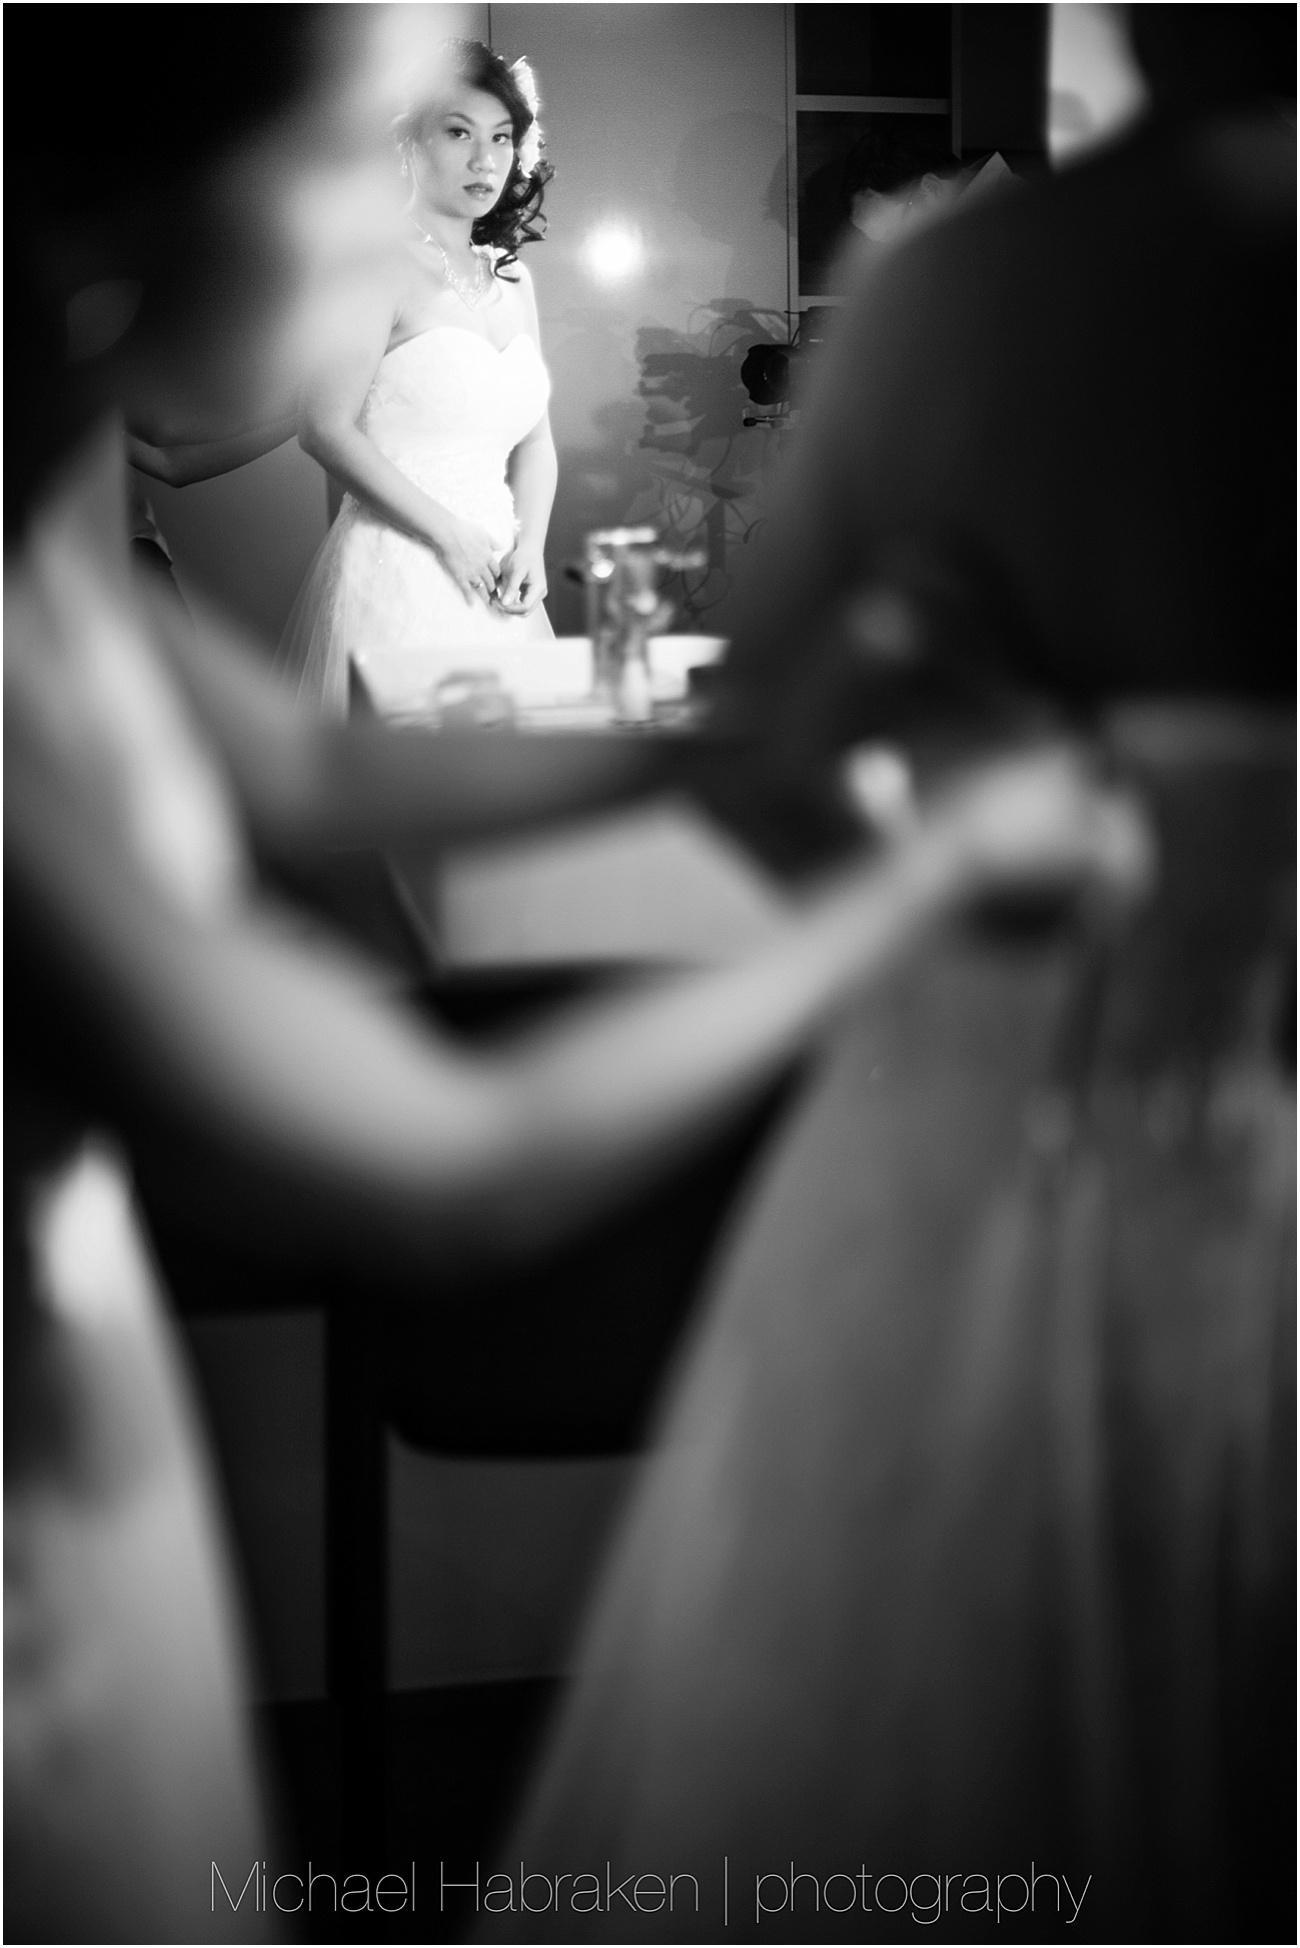 MichaelHabraken|photography_0662.jpg